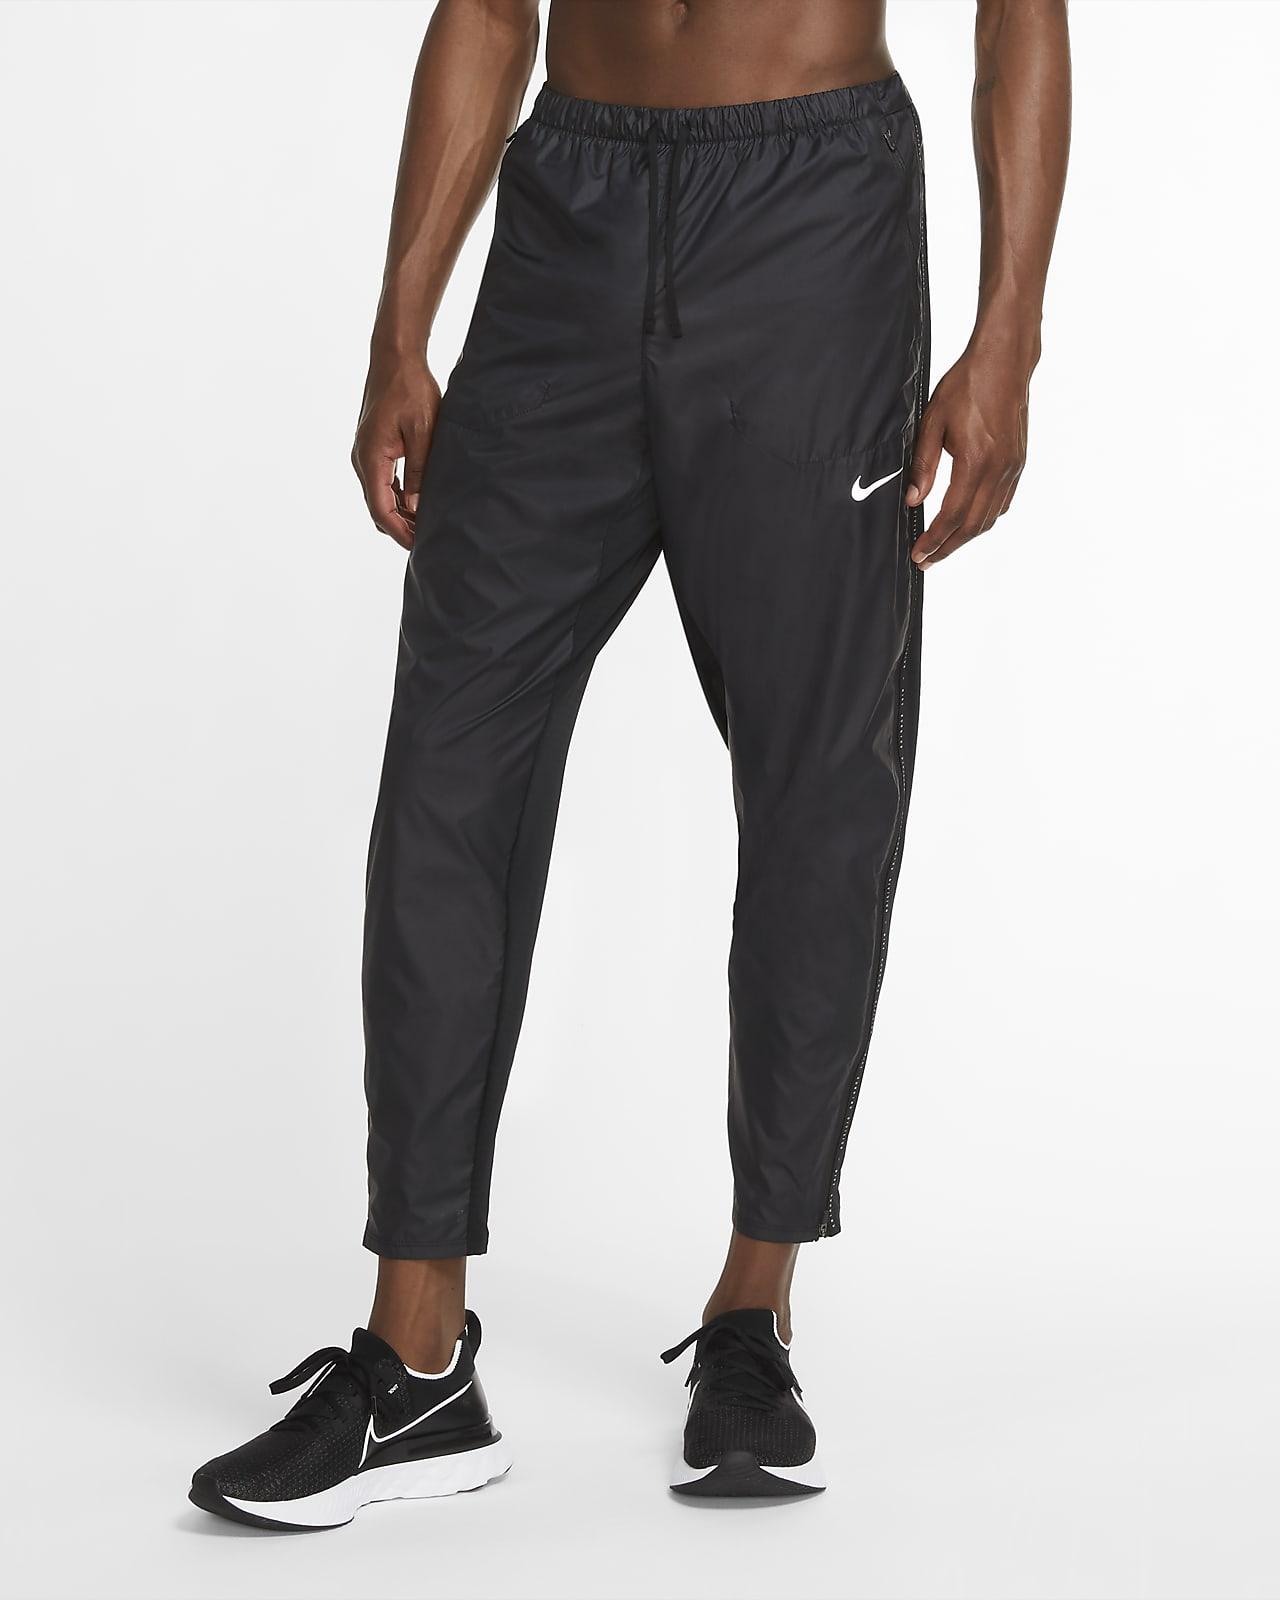 Nike Phenom Elite Shield Run Division Men's Running Pants